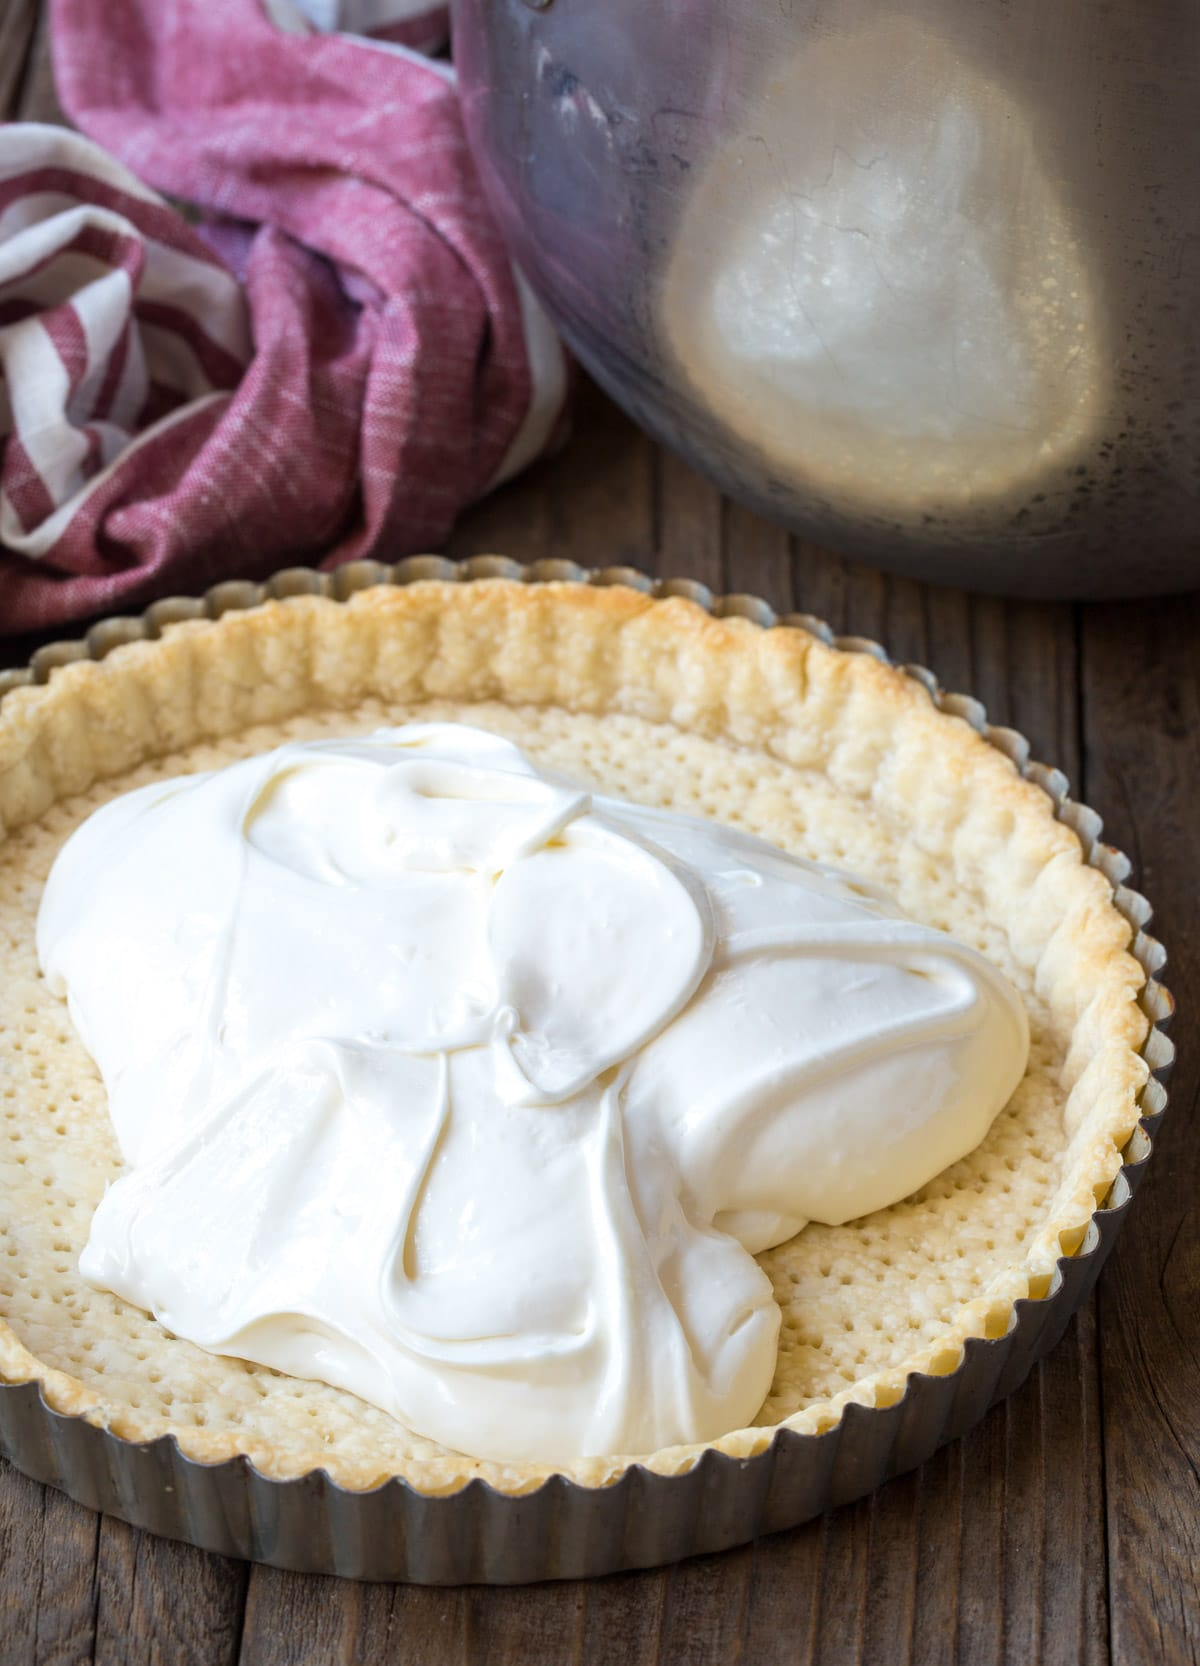 Making Pomegranate Cream Tart Recipe #ASpicyPerspective #holiday #pomegranaterecipe